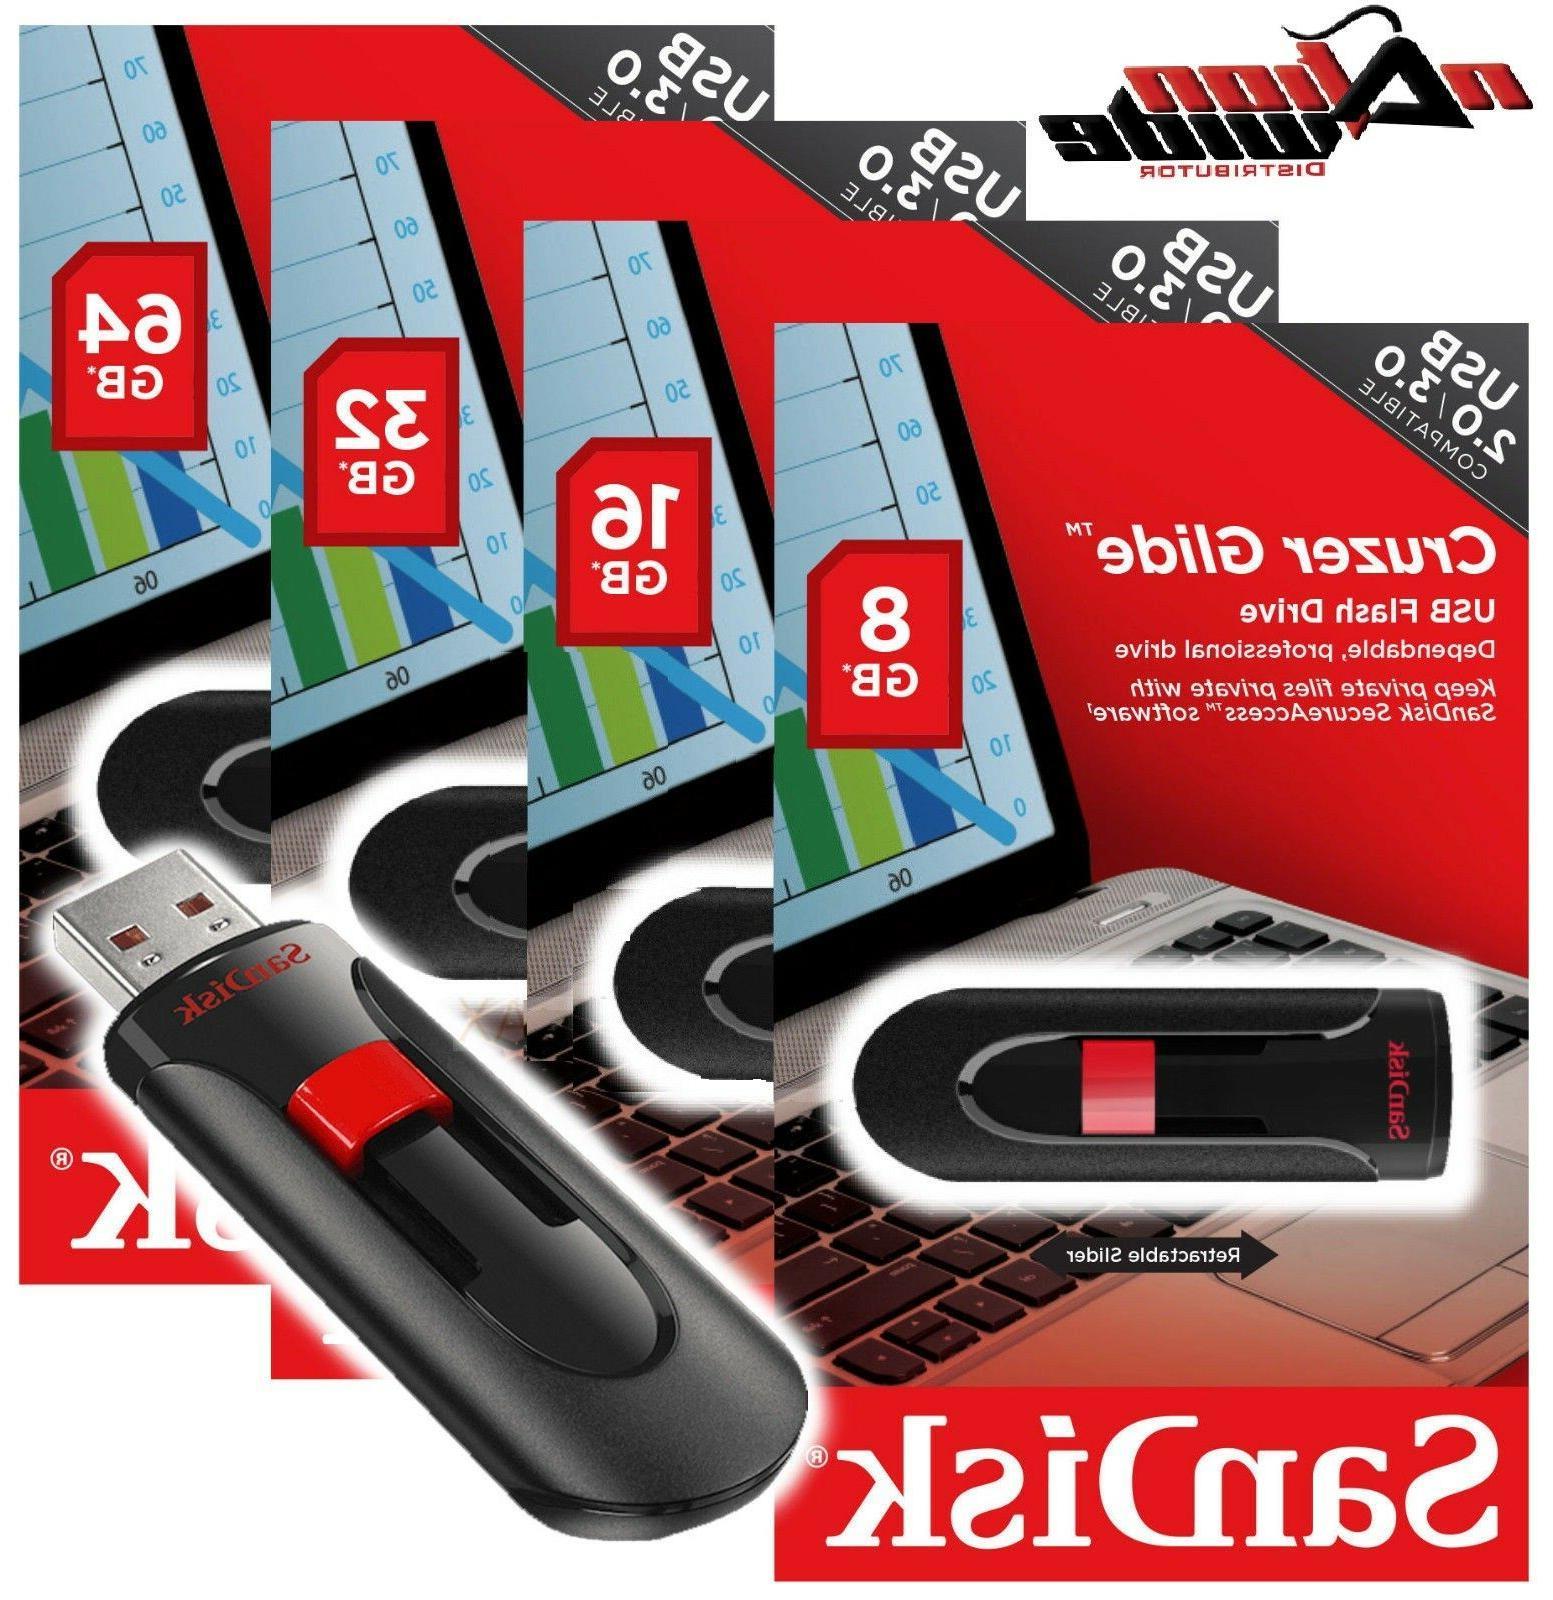 SanDisk 16GB 32G 64GB 128G CRUZER GLIDE USB 2.0 Flash Memory